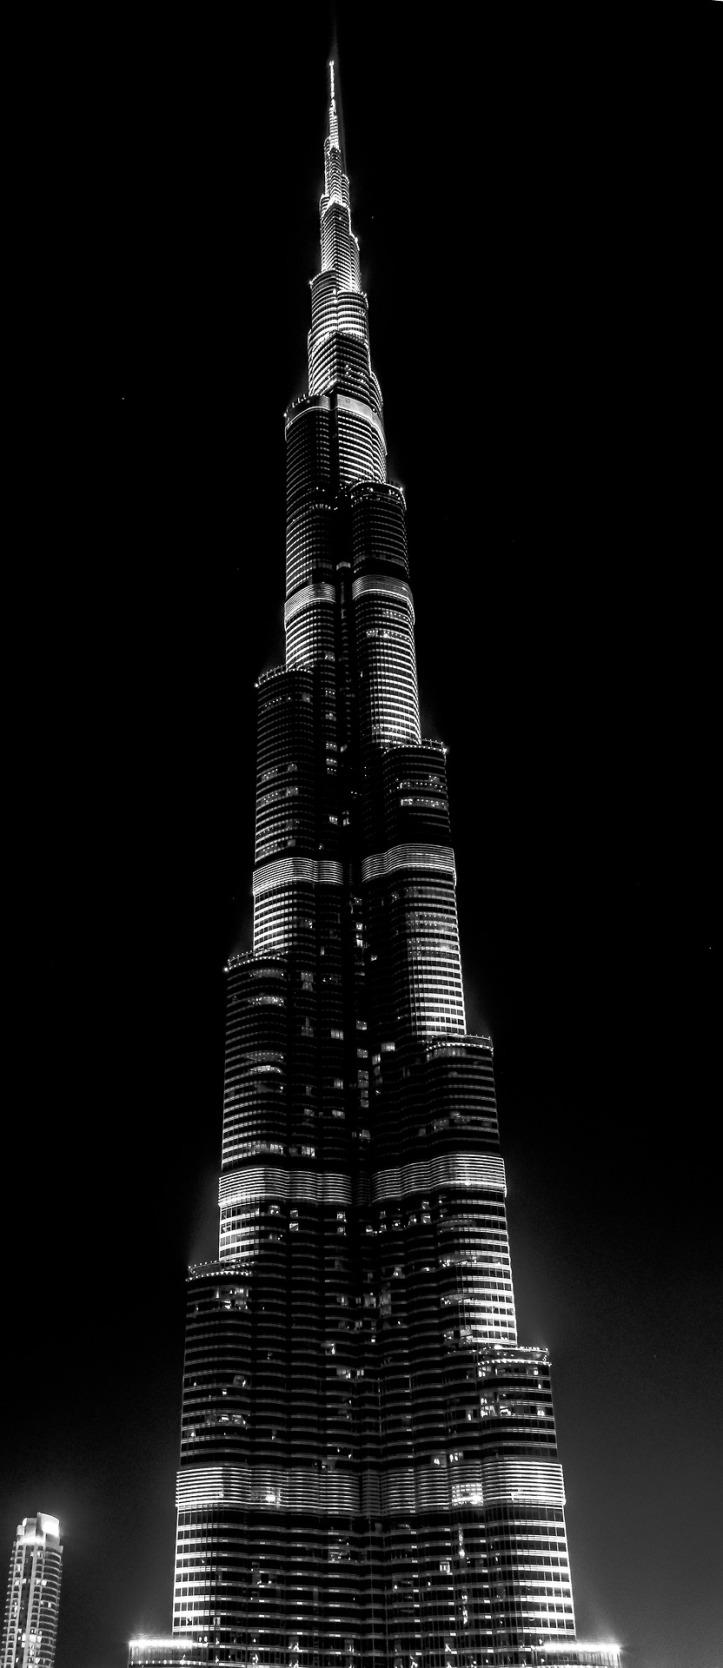 Burj Khalifa - the world's tallest building located in Dubai UAE- Photo by M. BAP